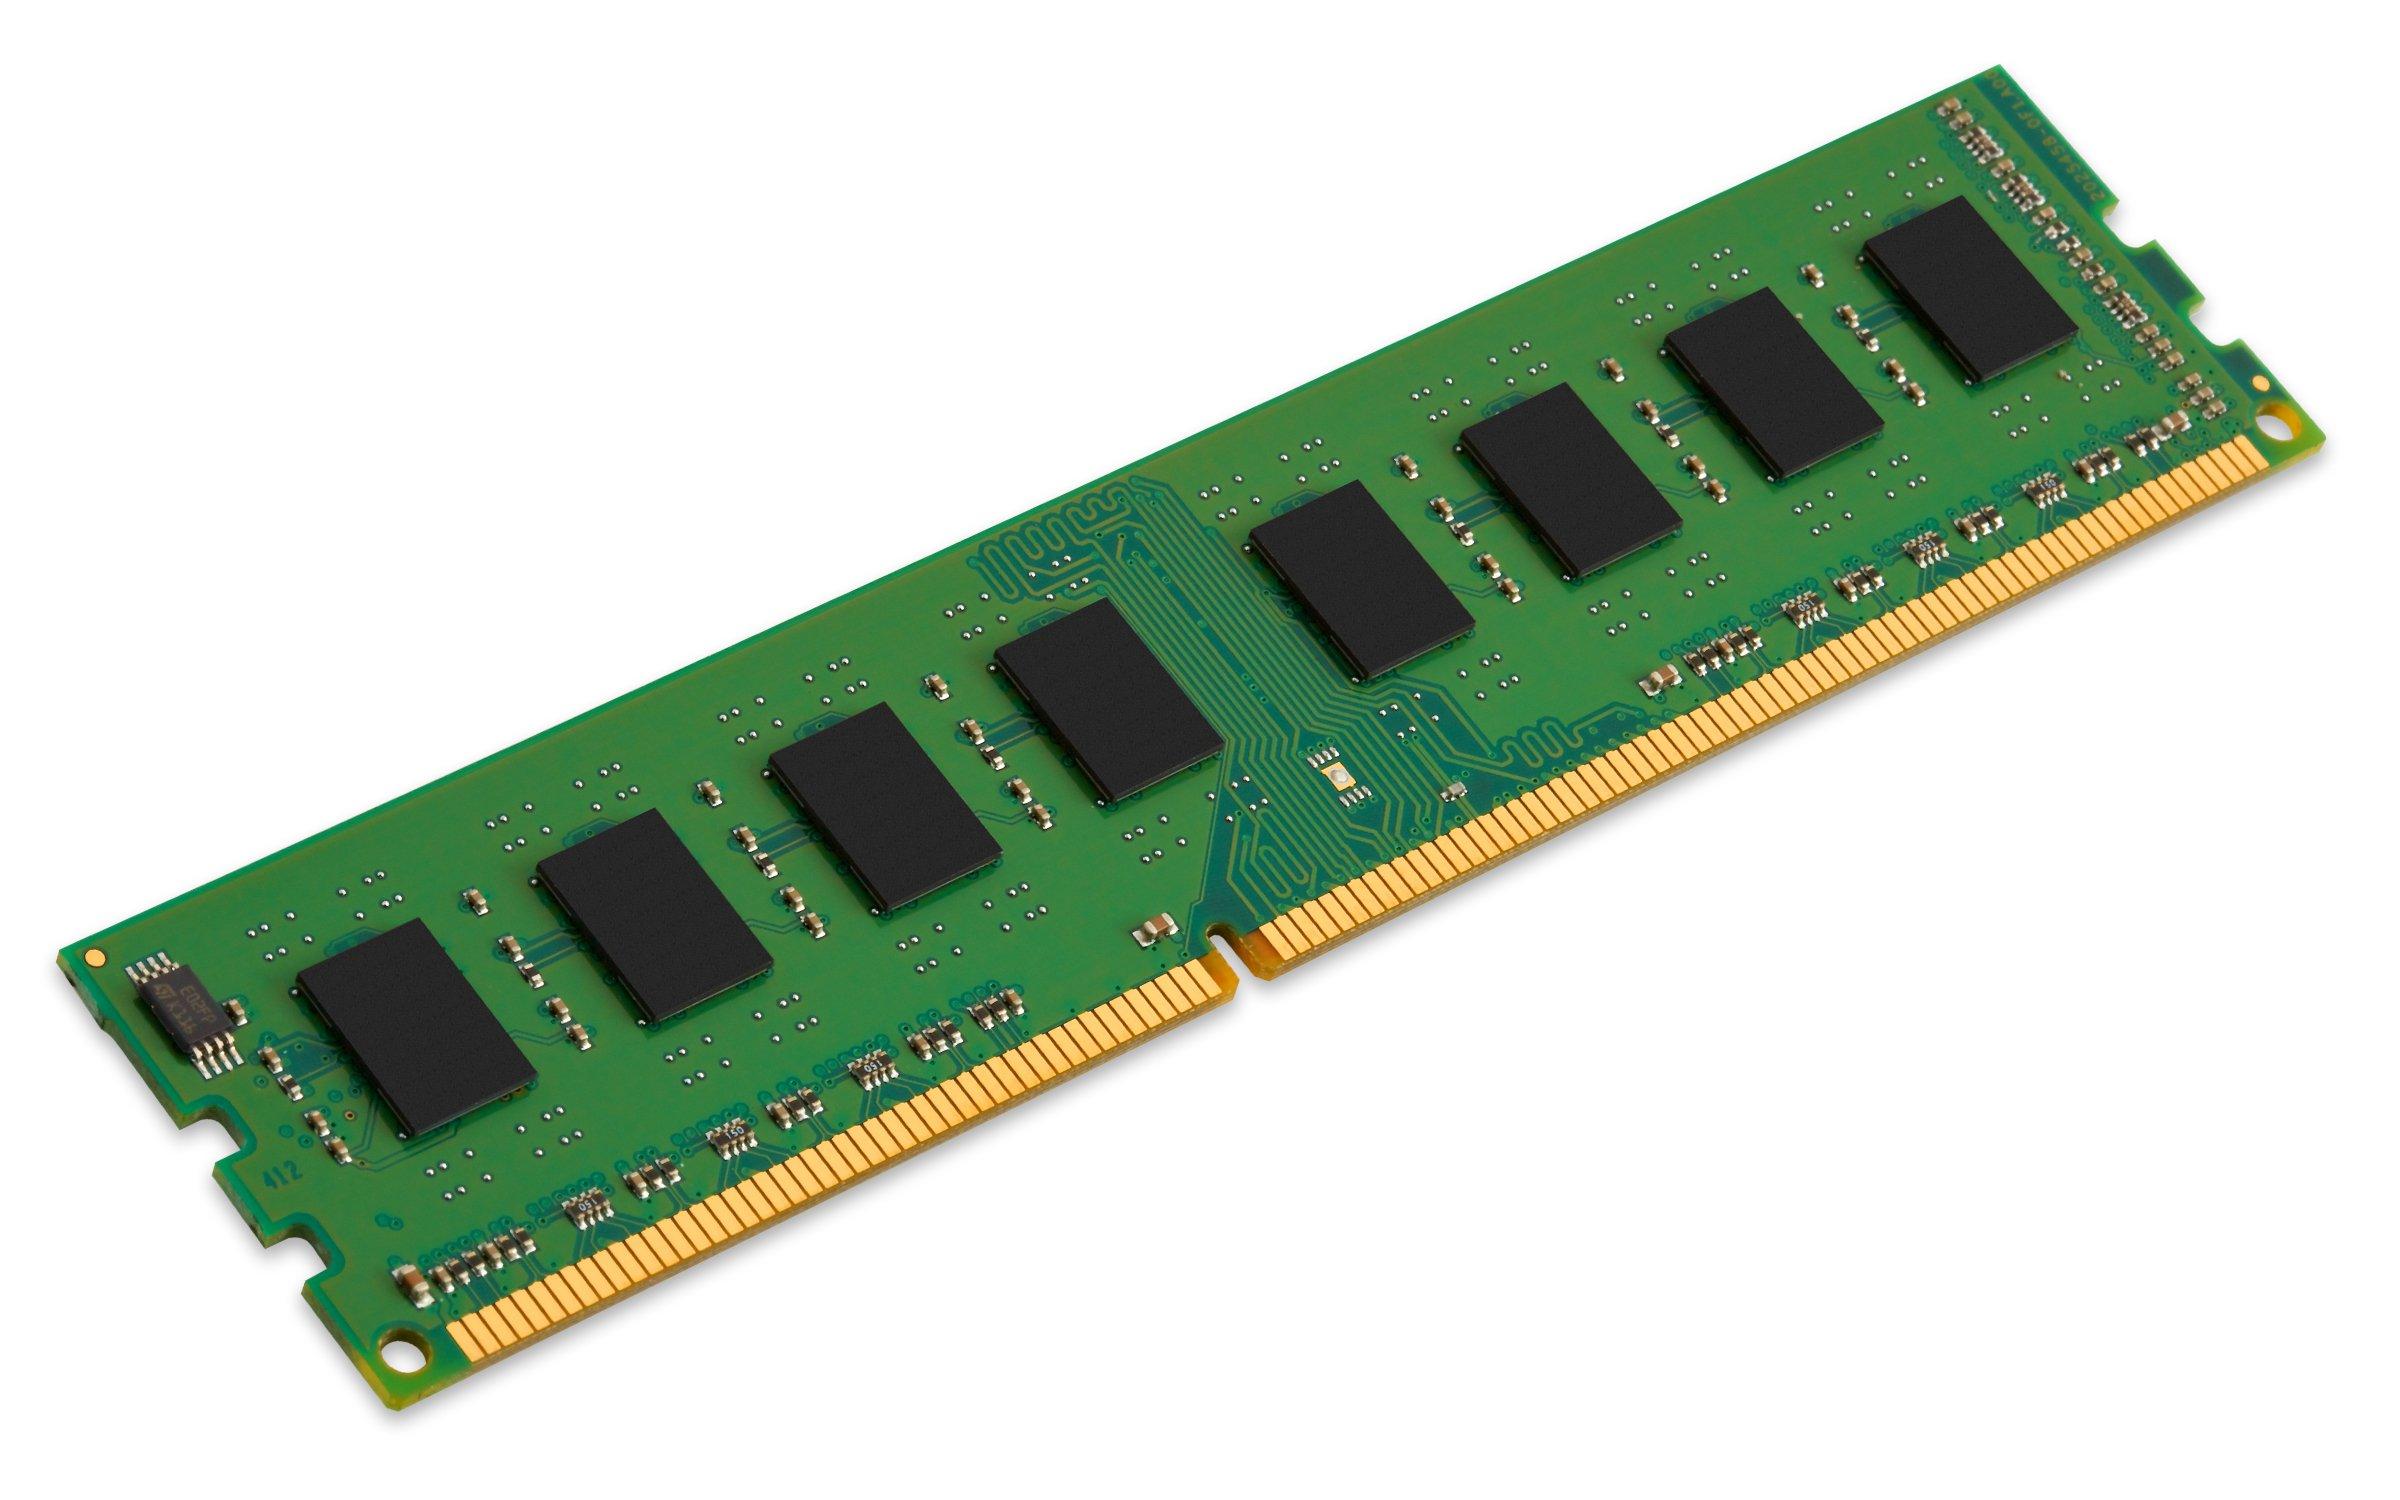 Kingston 4GB 1333MHz DDR3 Single Rank 240-pin Standard 512M X 64 Non-ECC Unbuffered DIMM (KCP313NS8/4) by Kingston (Image #2)